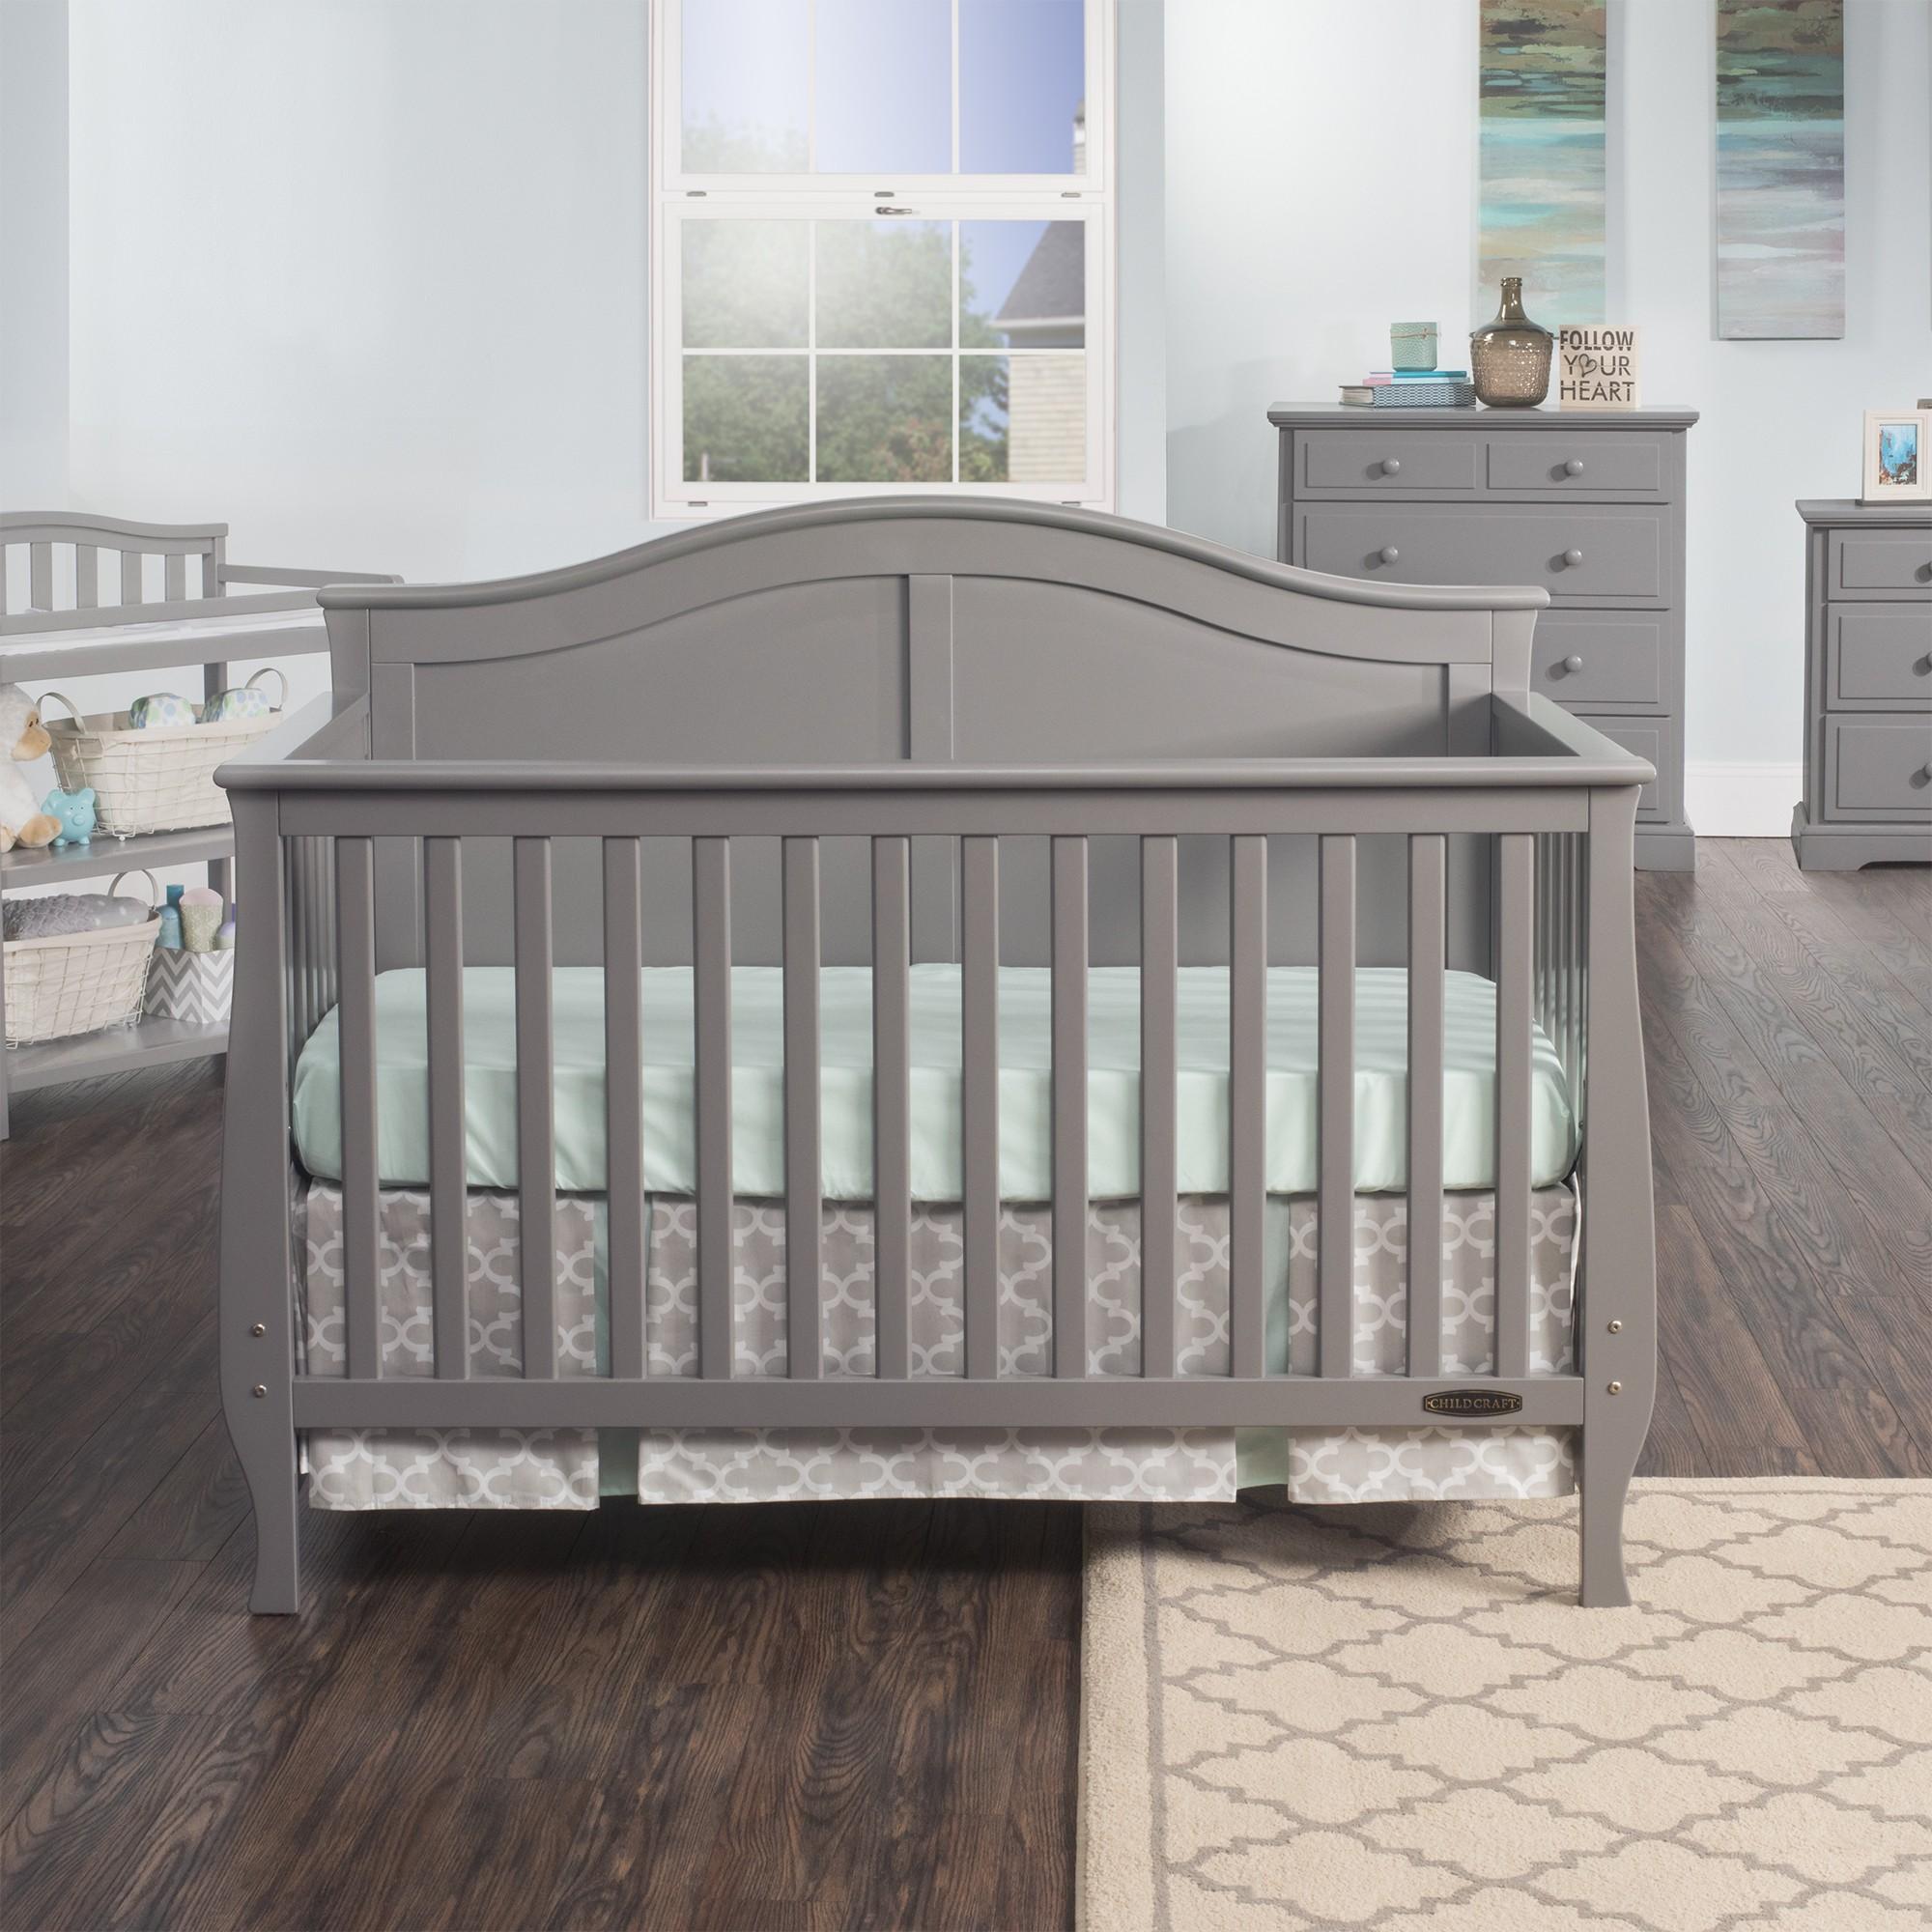 Child craft camden crib - 18